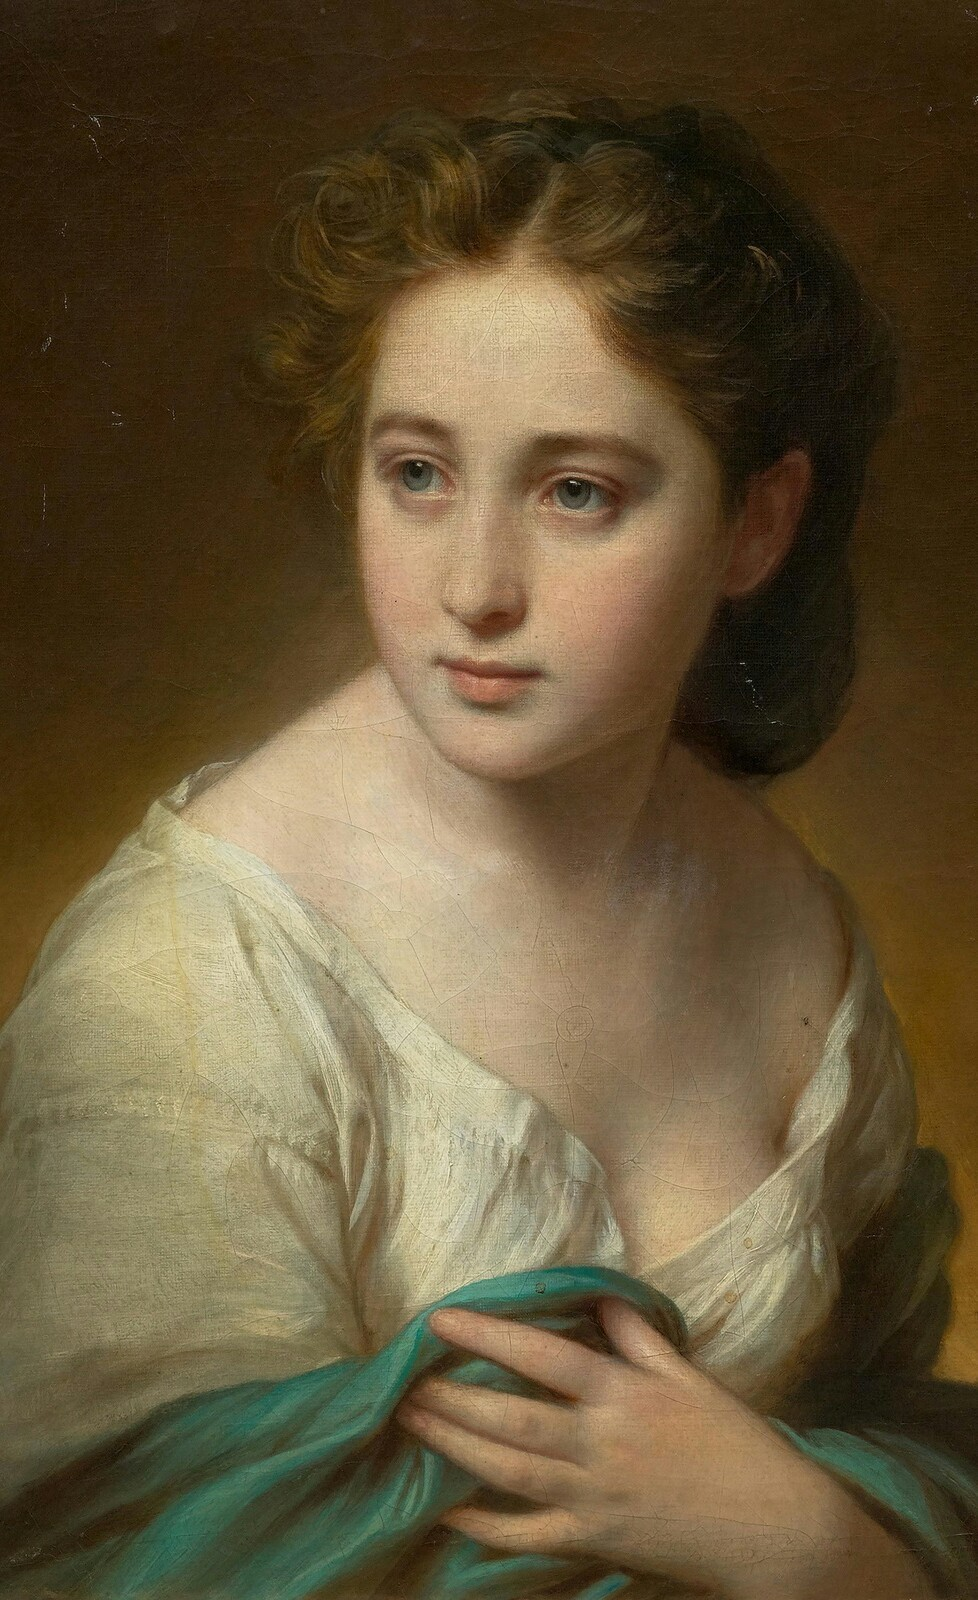 मैंने माँगी थी उजाले की फ़क़त इक किरन 'फ़राज़', तुम से ये किसने कहा आग लगा दी जाए.. ...अहमद फ़राज़ 'Life in the eyes of my love Bertina', 1836 Painting by Franz Xaver Winterhalter, German, 1805 - 1873 ______________________________ मैंने माँगी थी उजाले की फ़क़त इक किरन 'फ़राज़', तुम से ये किसने कहा आग लगा दी जाए.. ...अहमद फ़राज़ फ़क़त : only I have asked only one ray of light (love) , But who have asked to flare the total fire (passionate love) .